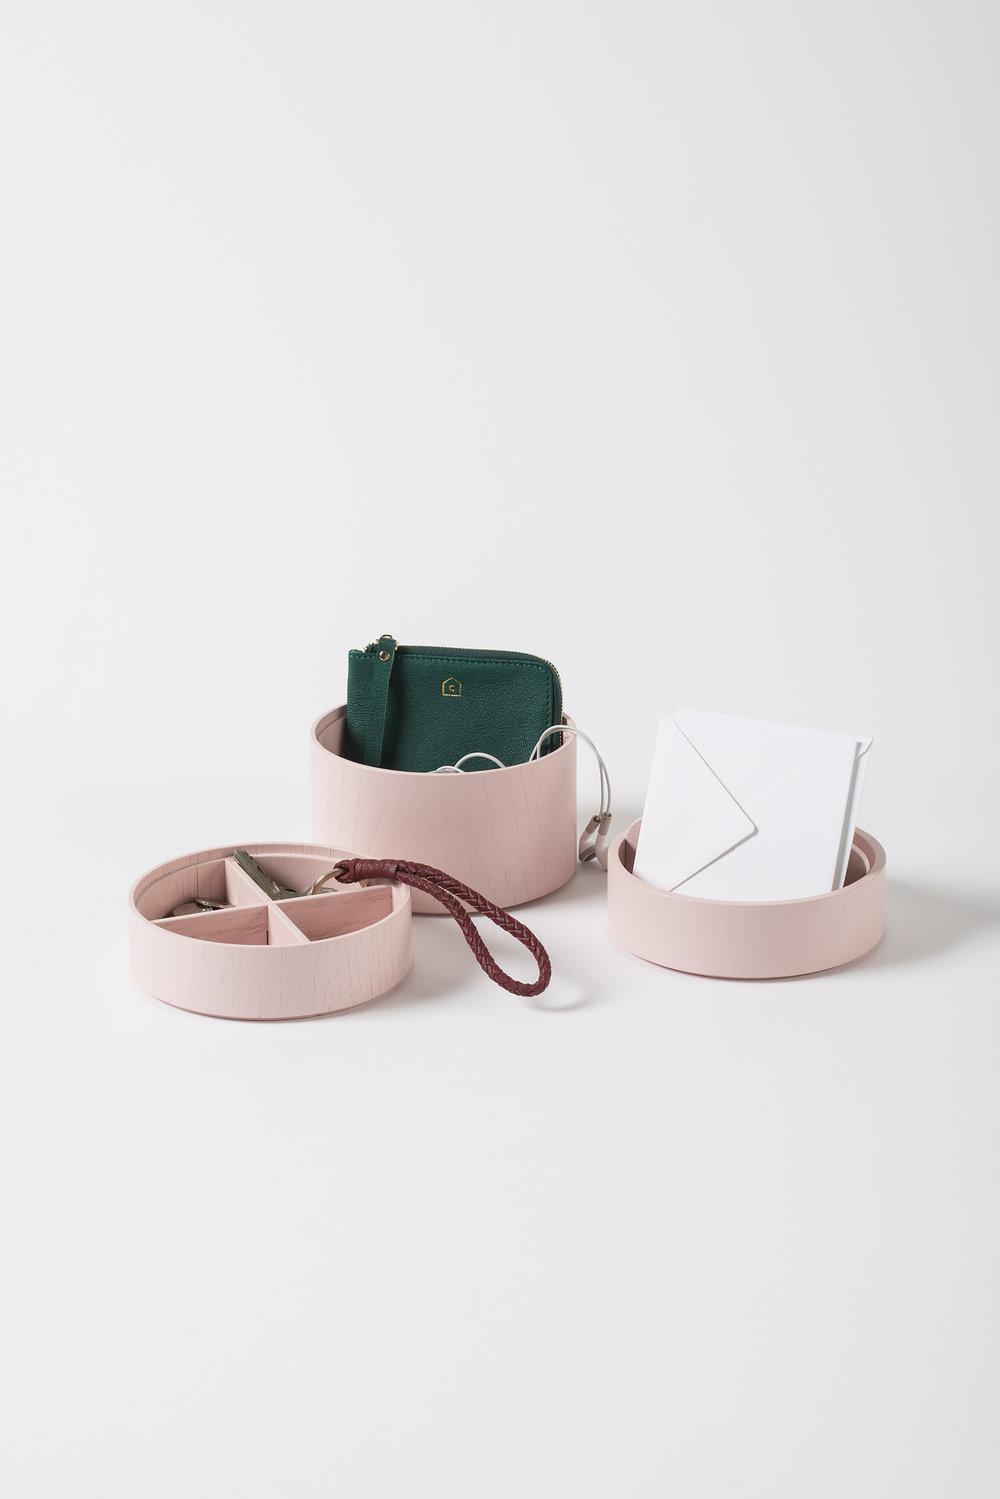 Small Pink Gaussian 3 Tier Vessel $149